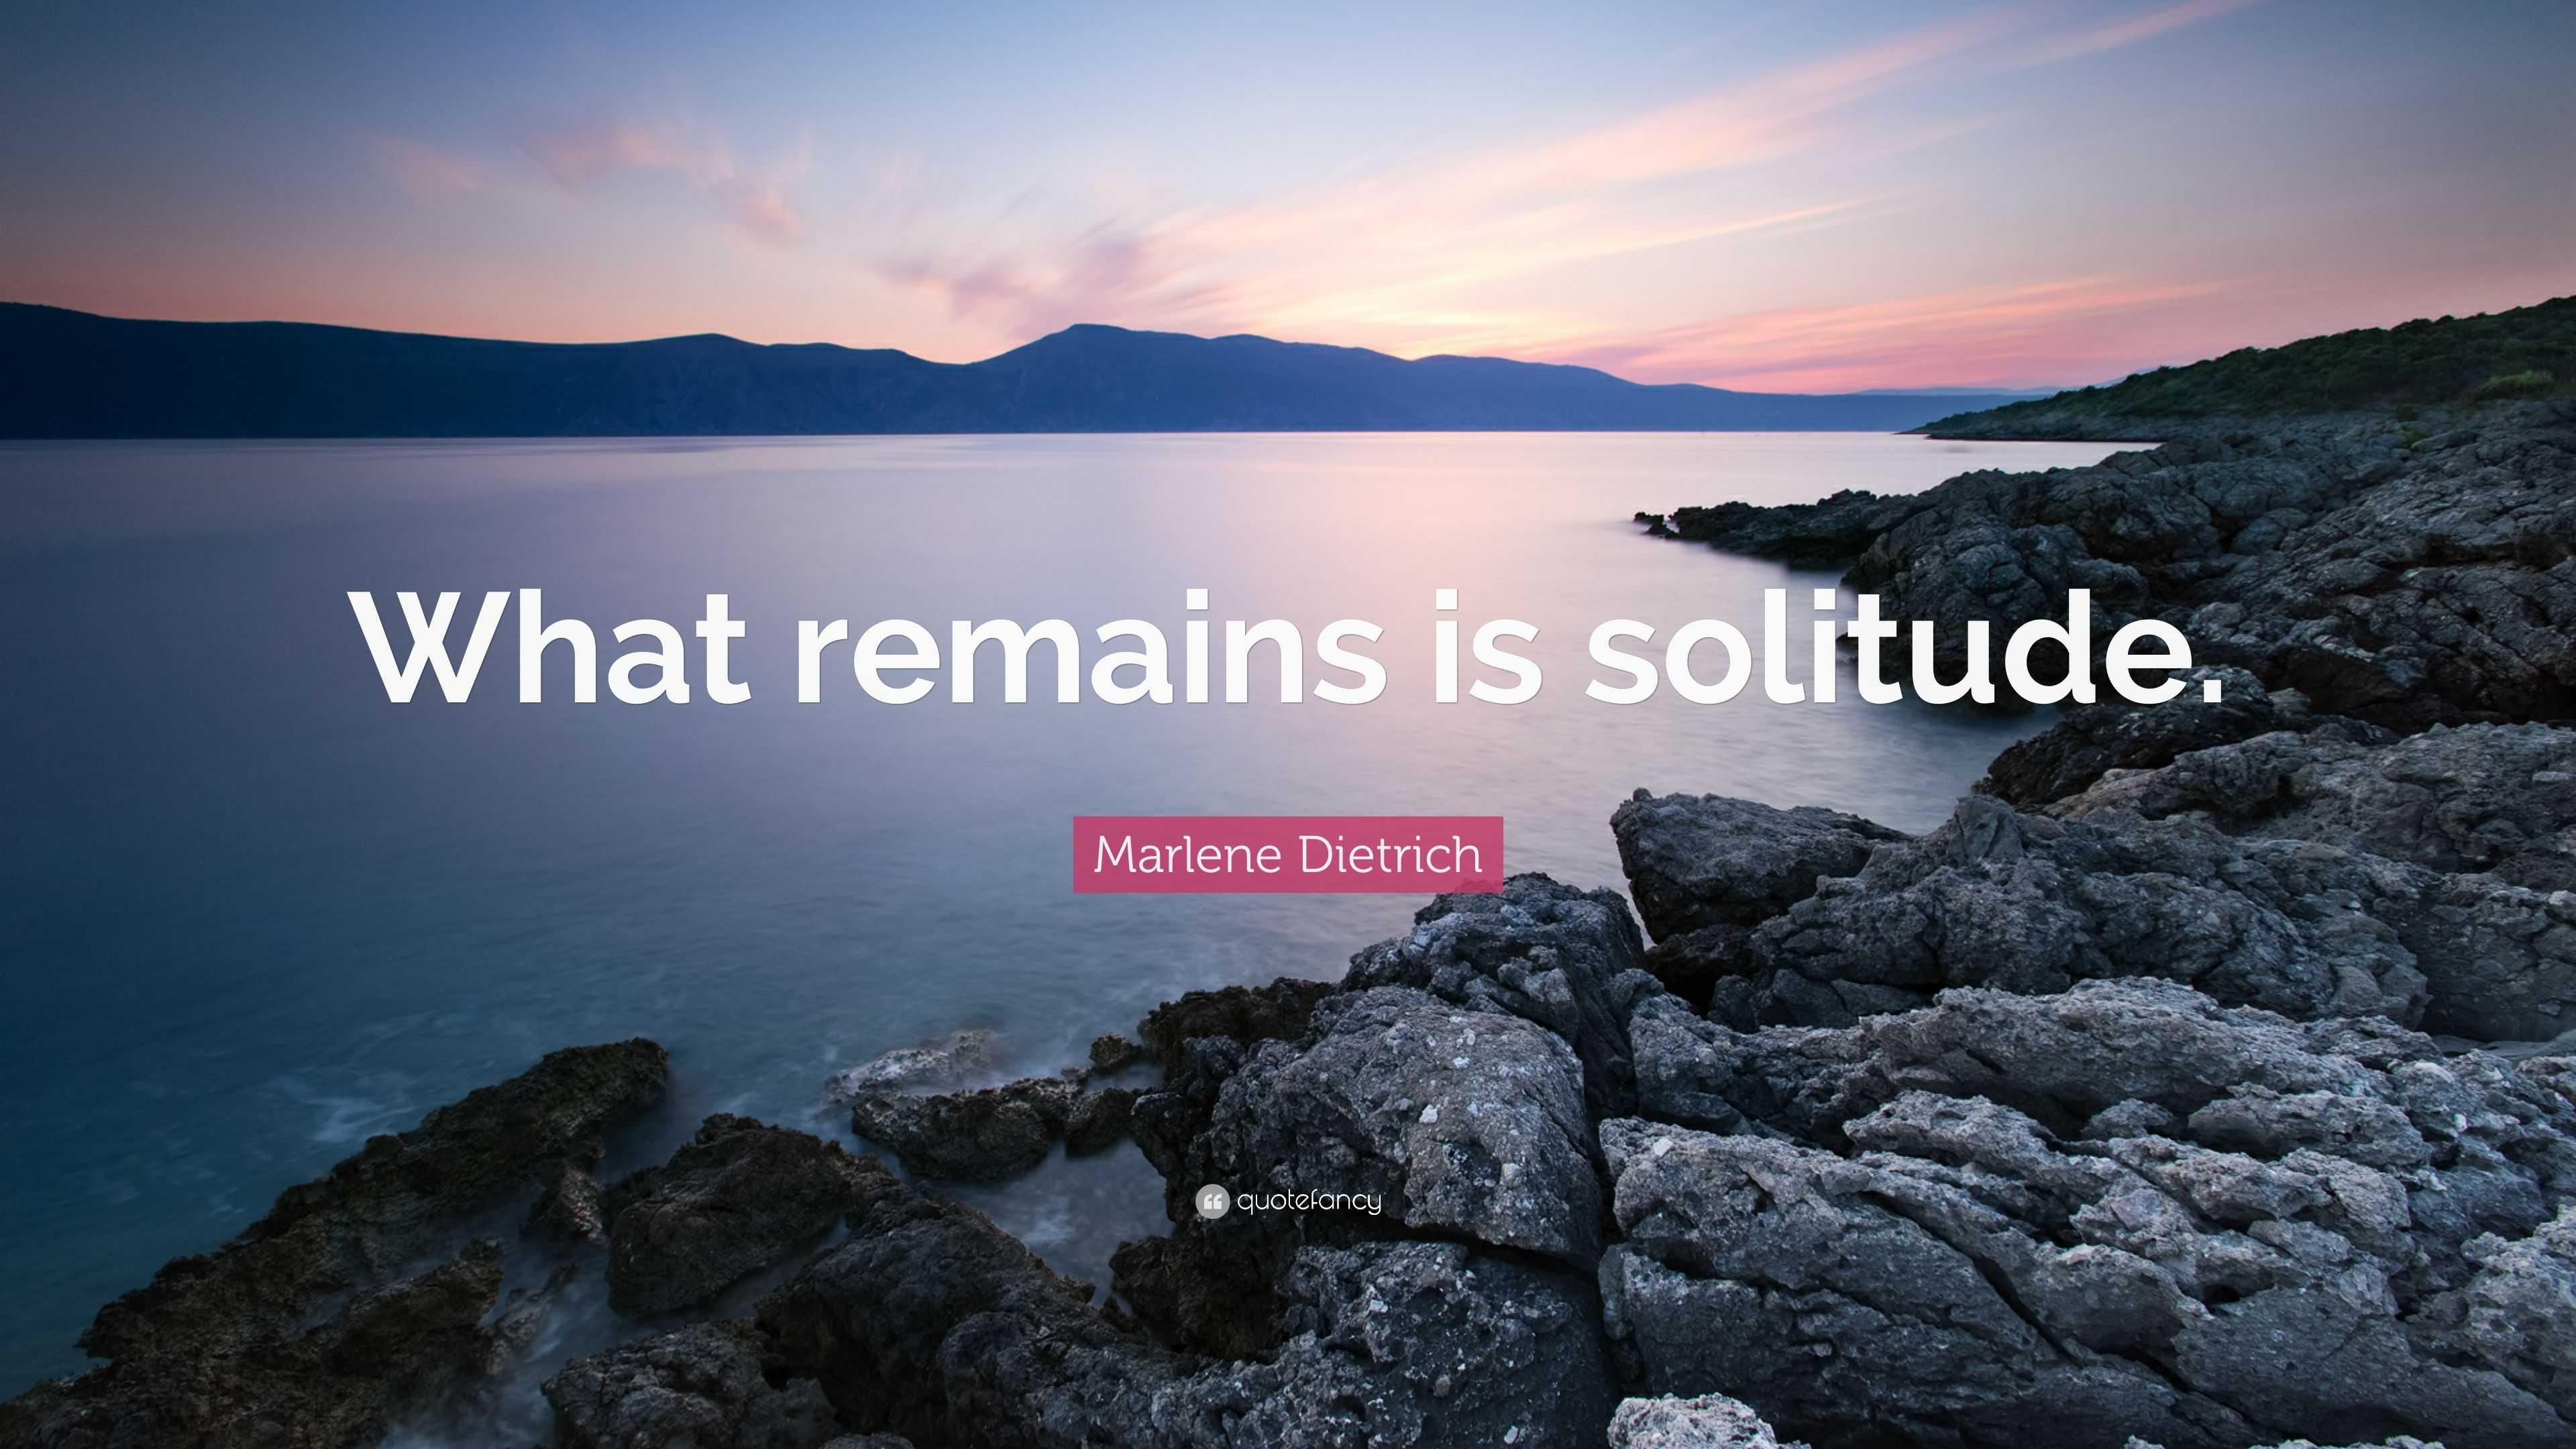 The Solitude of Marlene